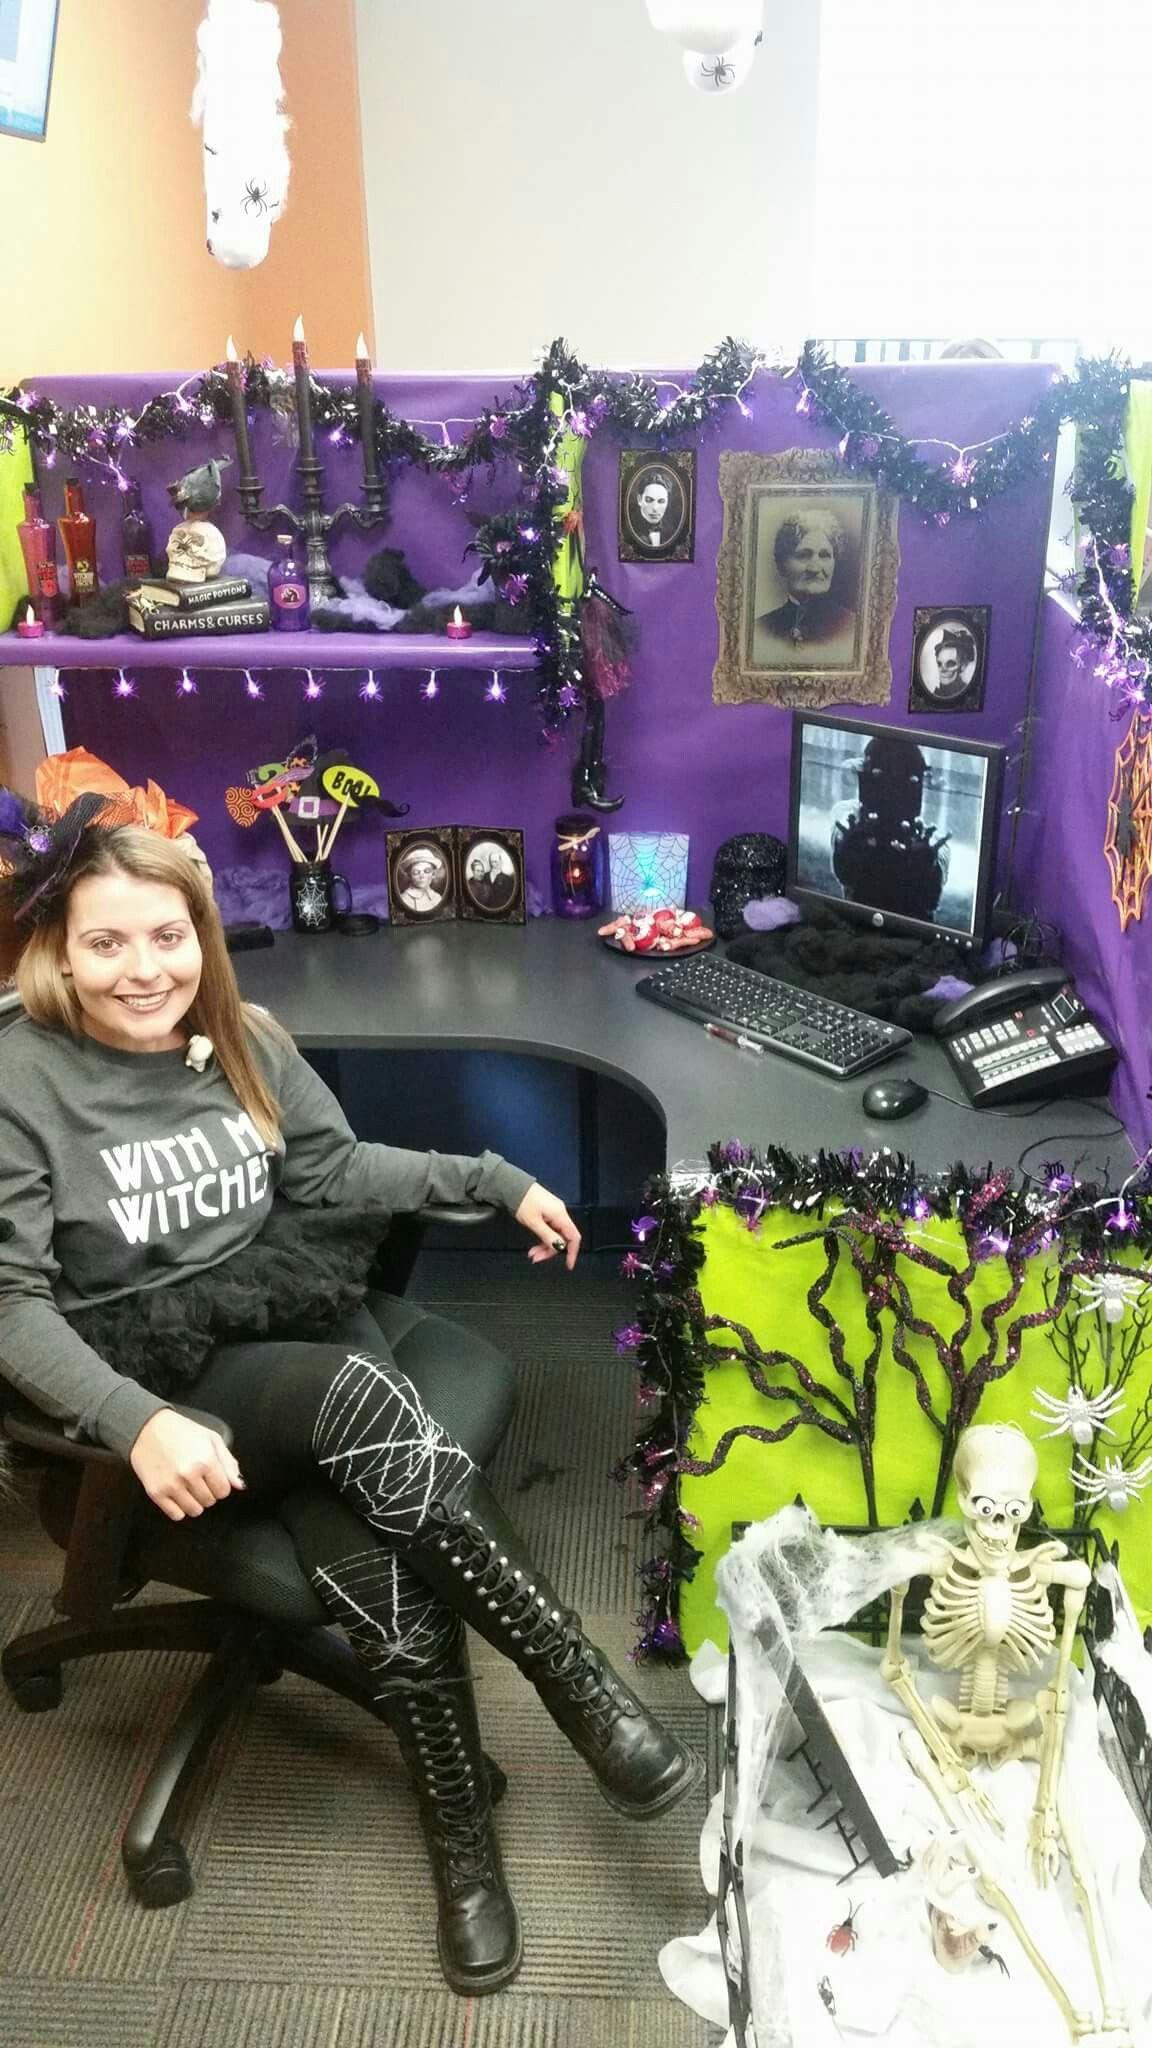 Drap black orange purple green fabric | Halloween | Pinterest